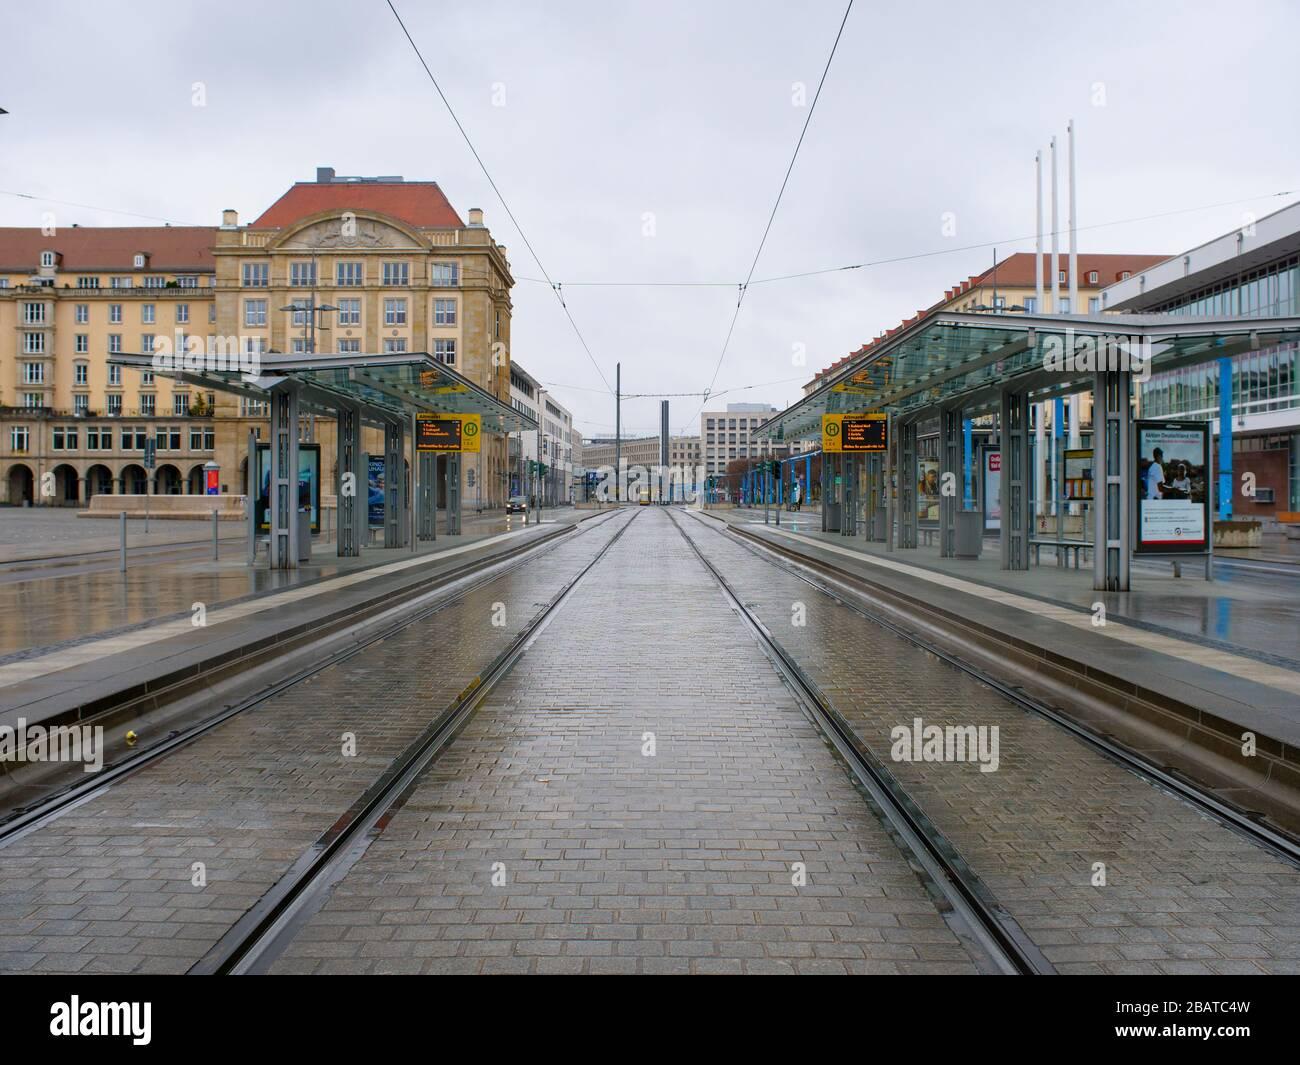 Dresden Altmarkt Tram Haltestelle DVB während Coronavirus Lockdown COVID-19 Ausgangssperre im Regen Foto de stock